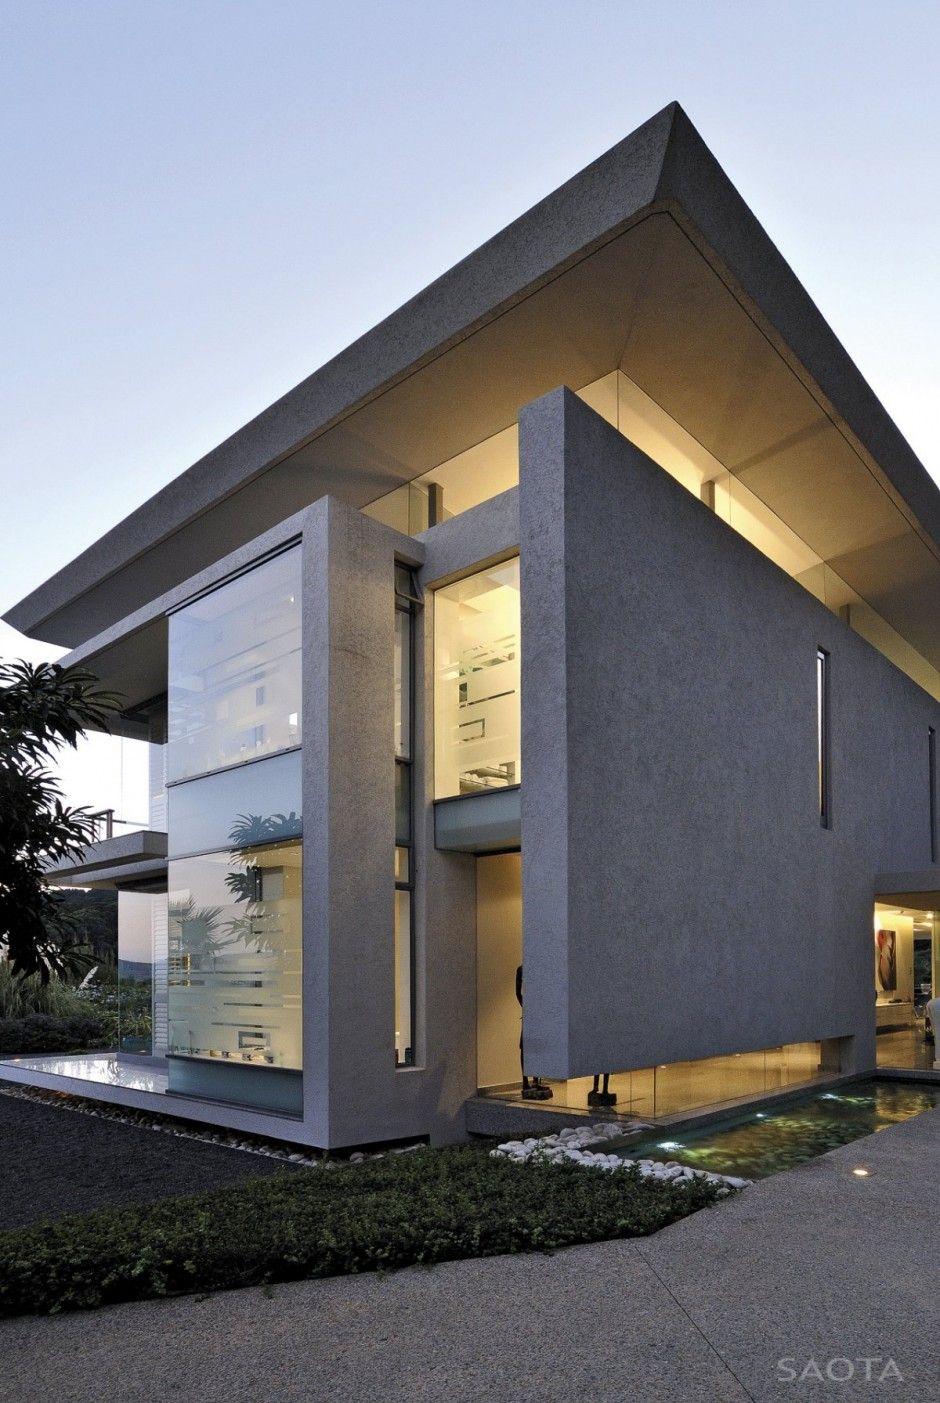 Saota stefan antoni olmesdahl truen have designed the montrose house in cape town south